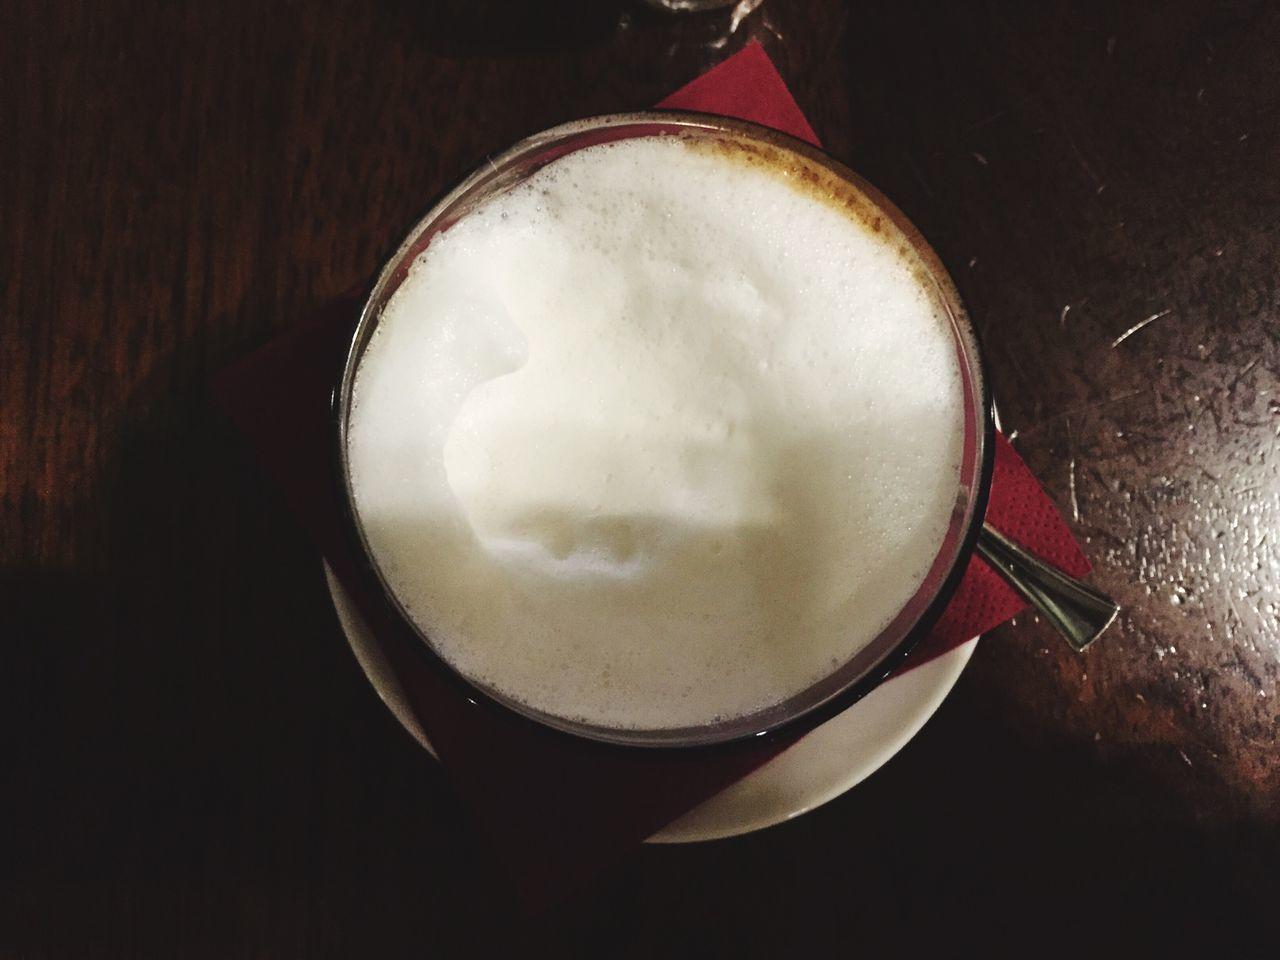 Liquid Lunch Italian Coffe Relaxing Montebianco Milk And Coffe